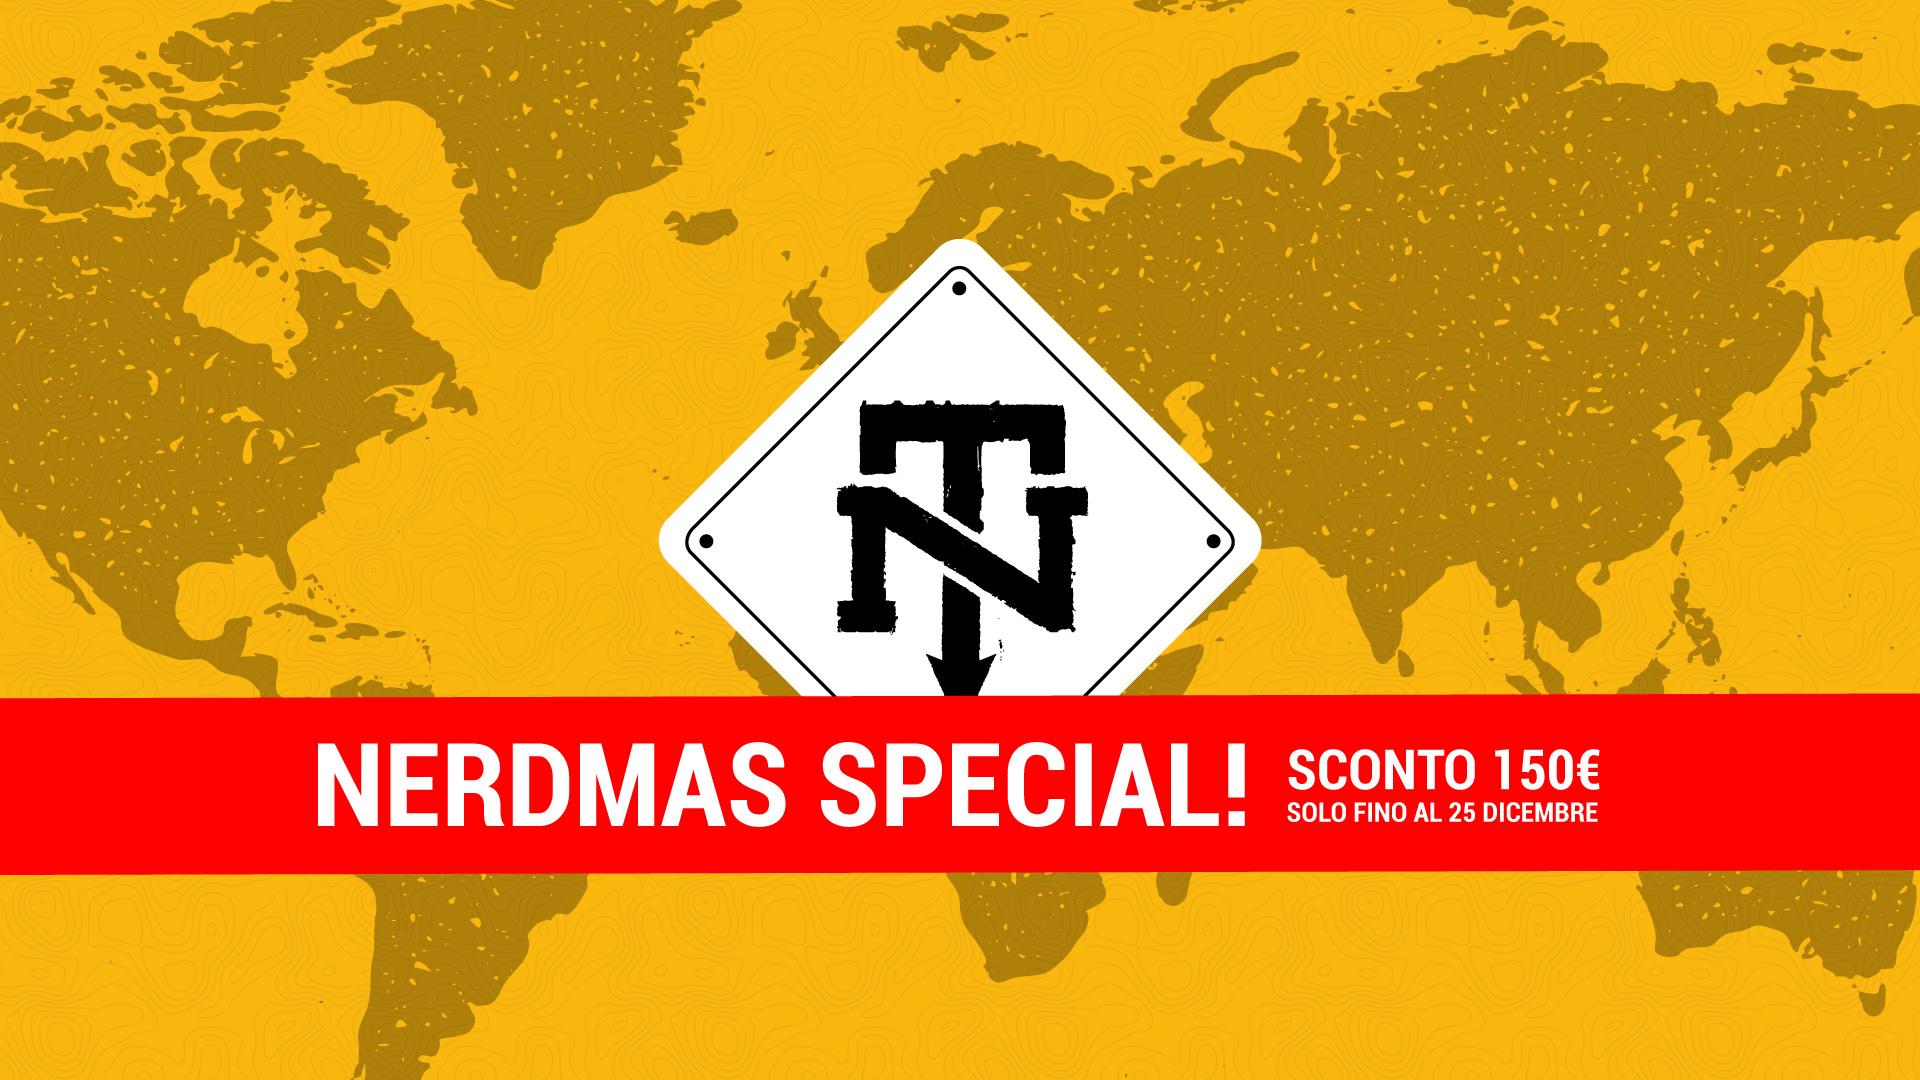 Nerdmas Special: 150€ di sconto sui nostri NerdTrip 2018!